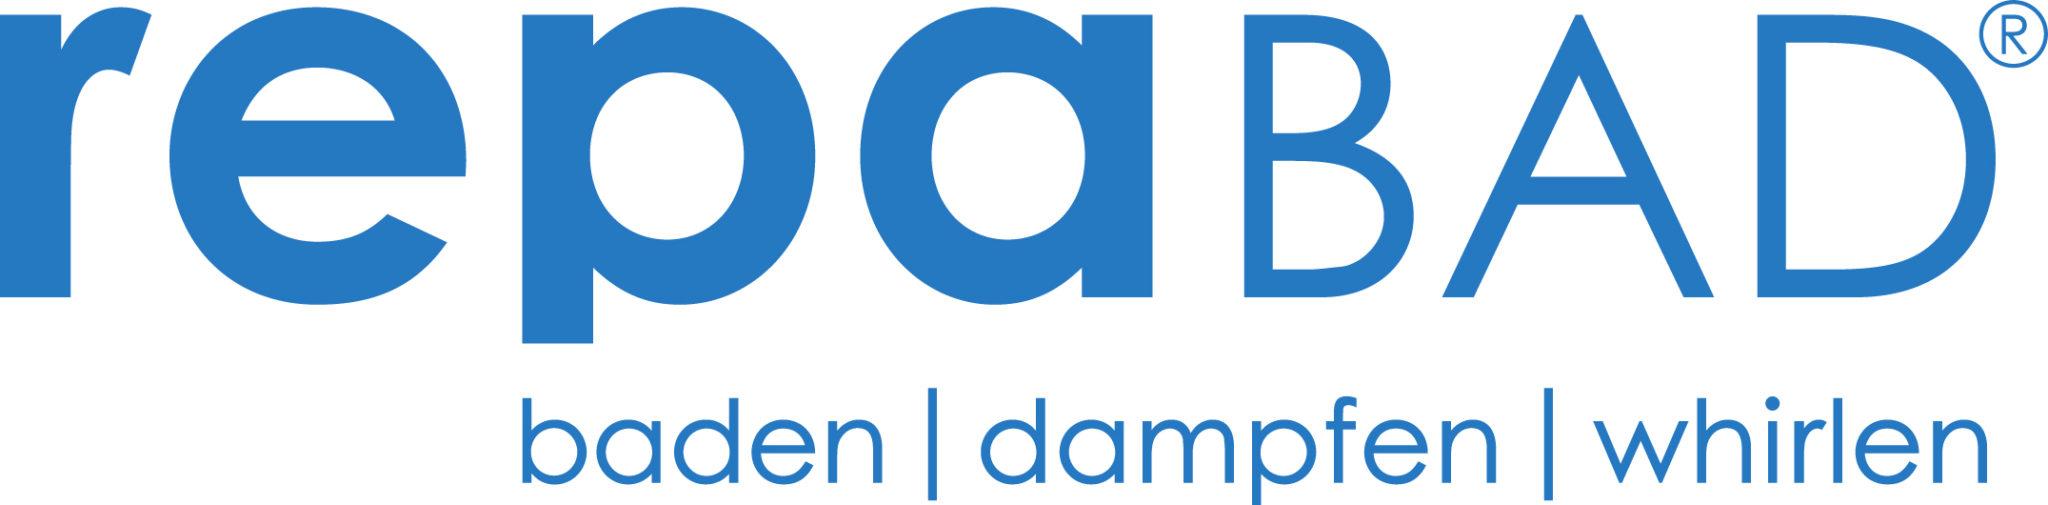 logo_repabad